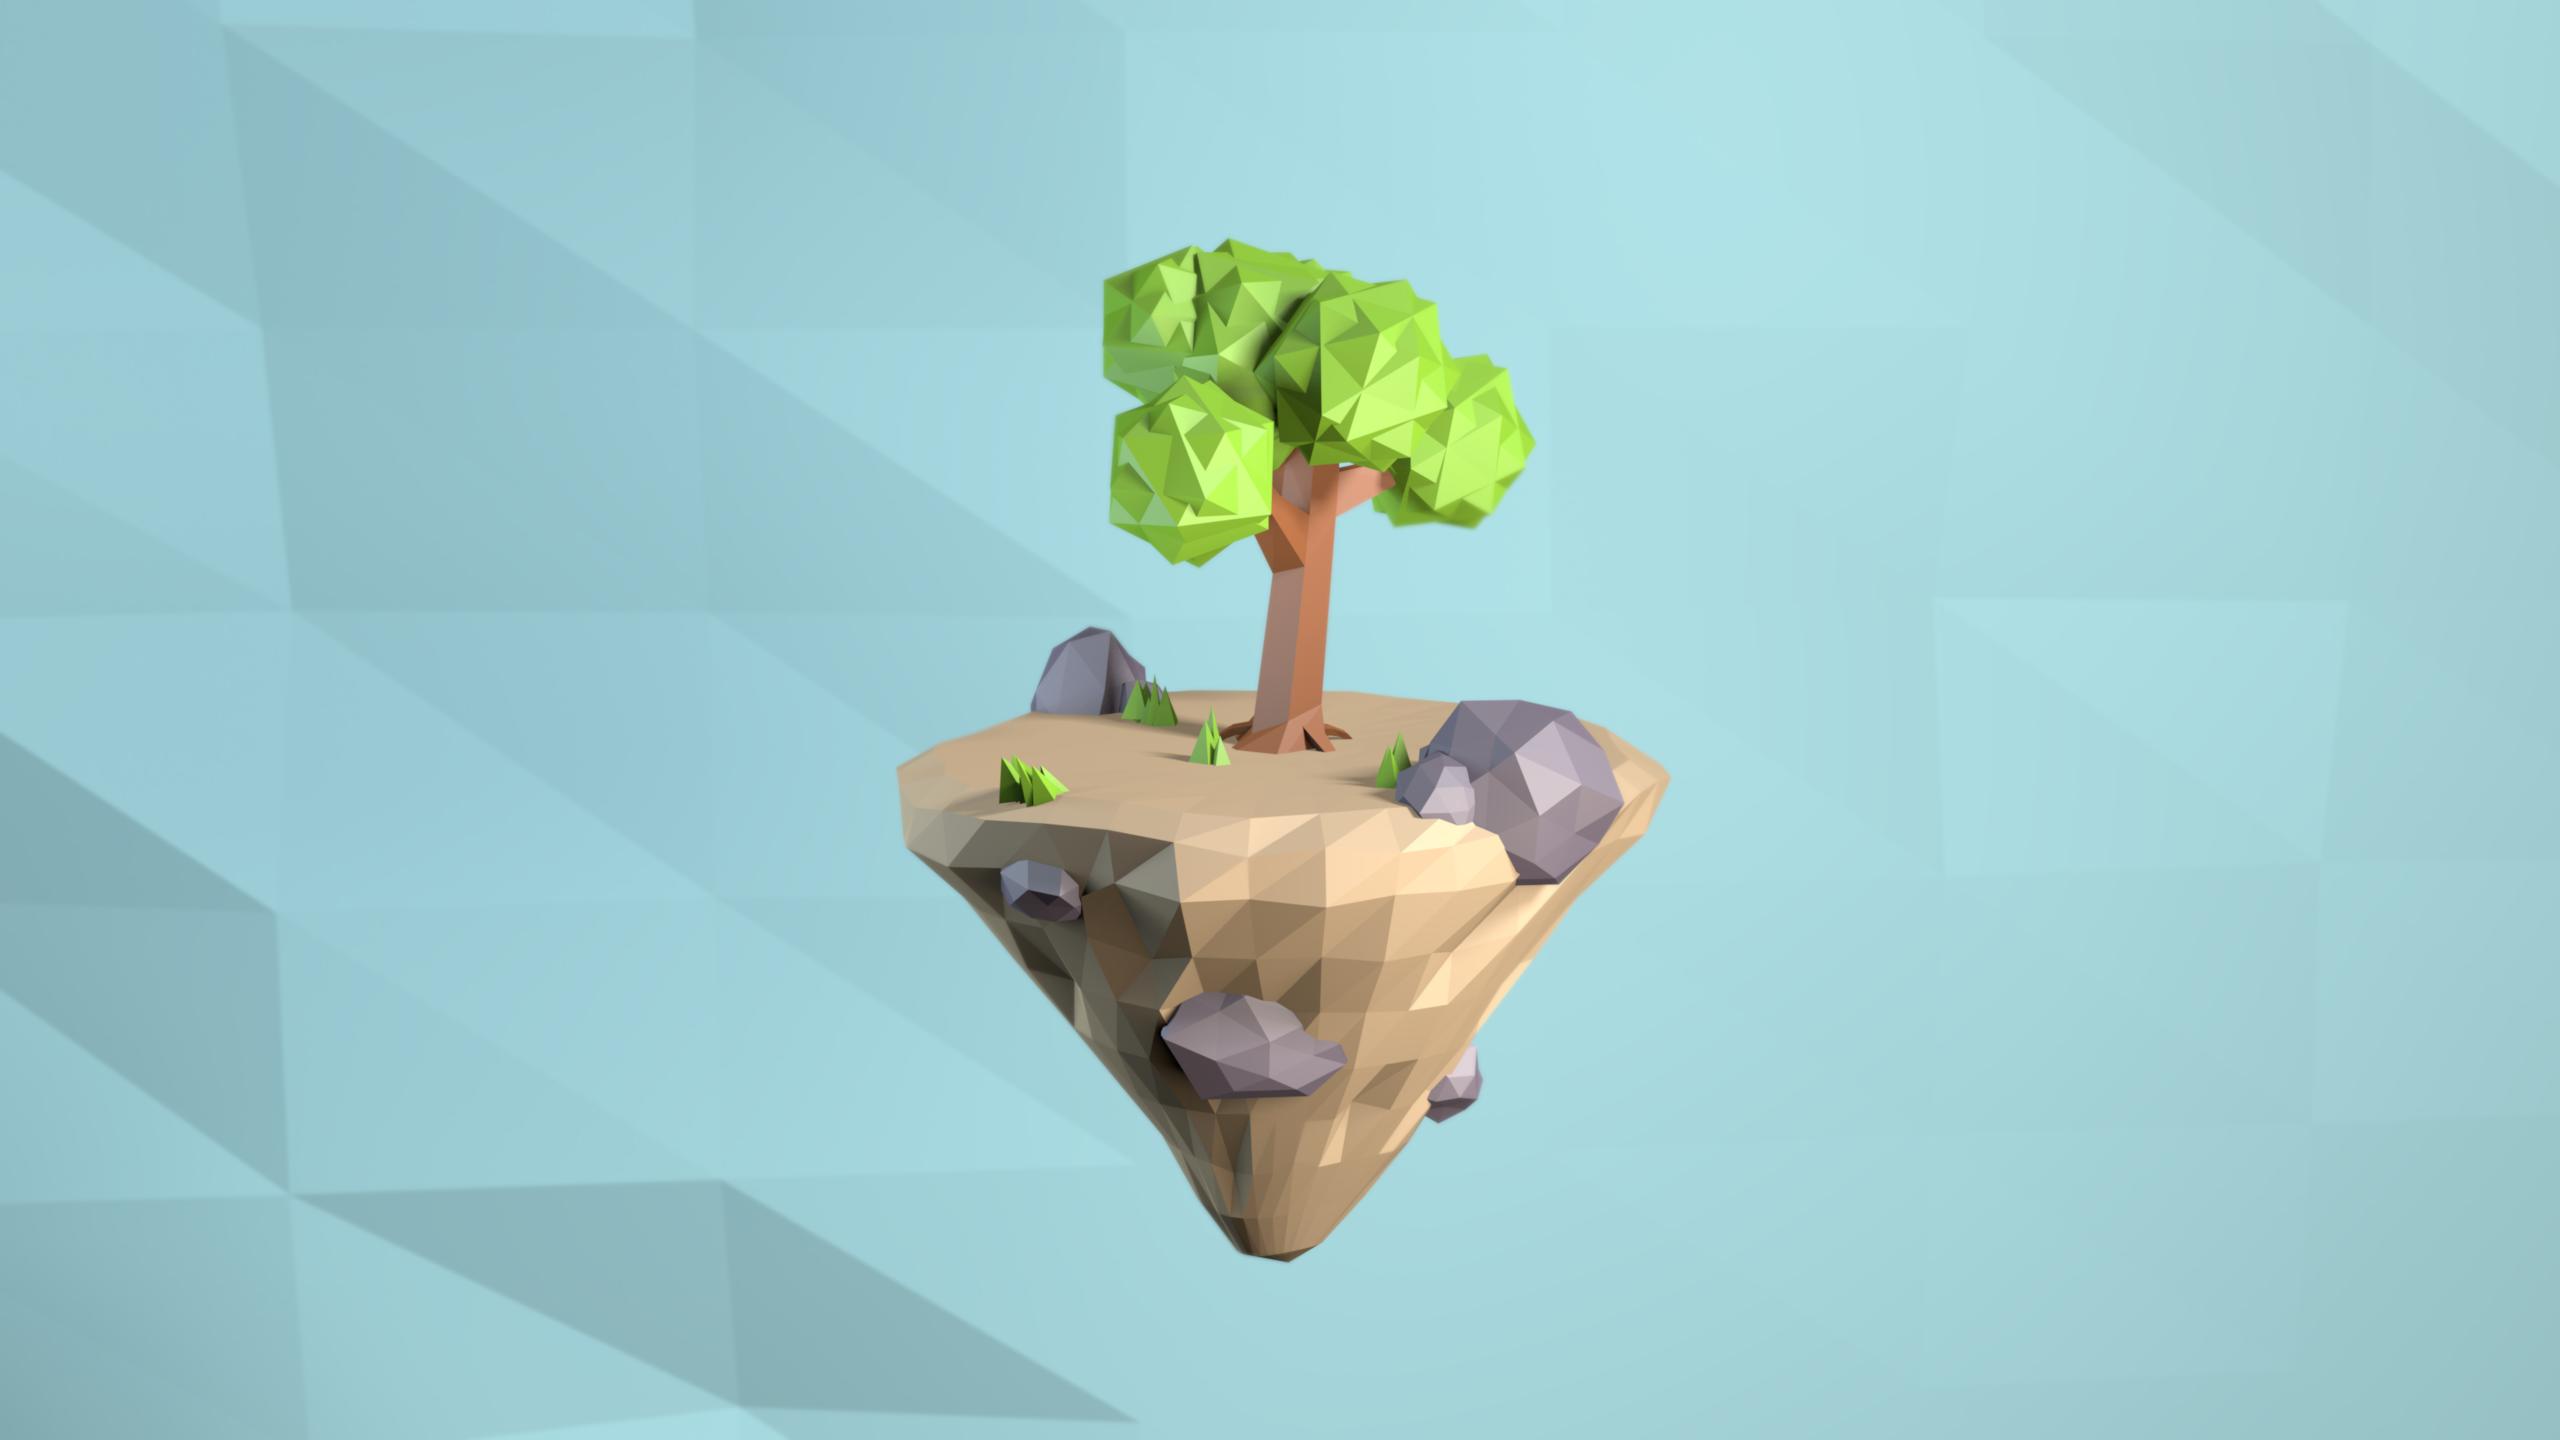 Low poly island by arrioch